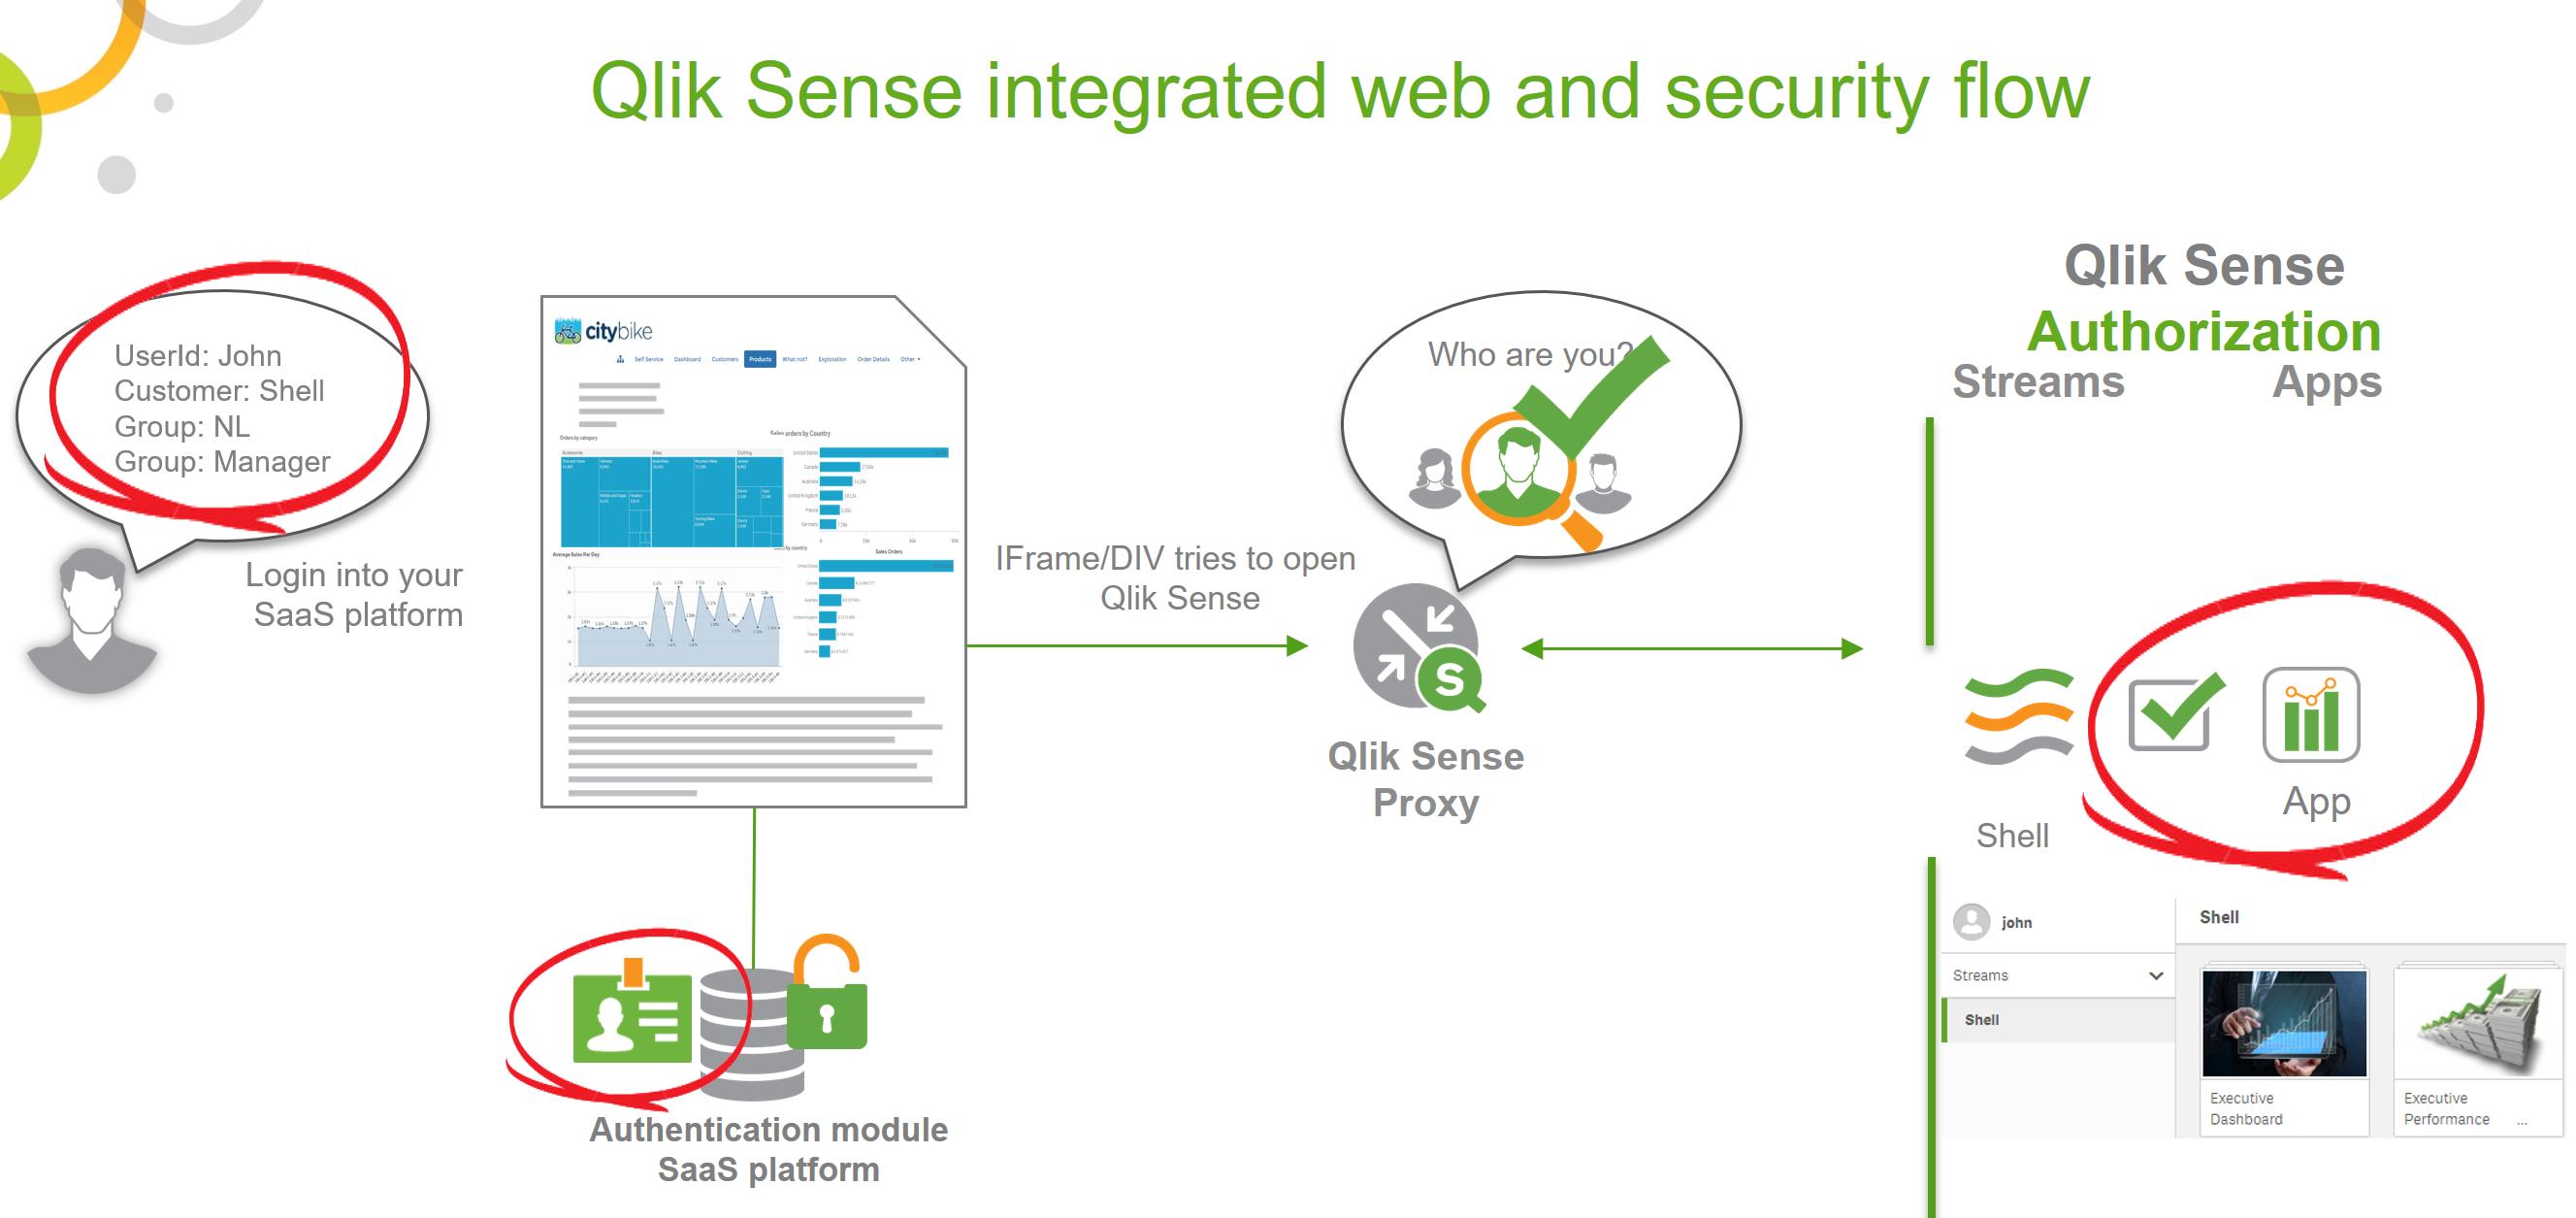 Qlik Sense API and integration demo